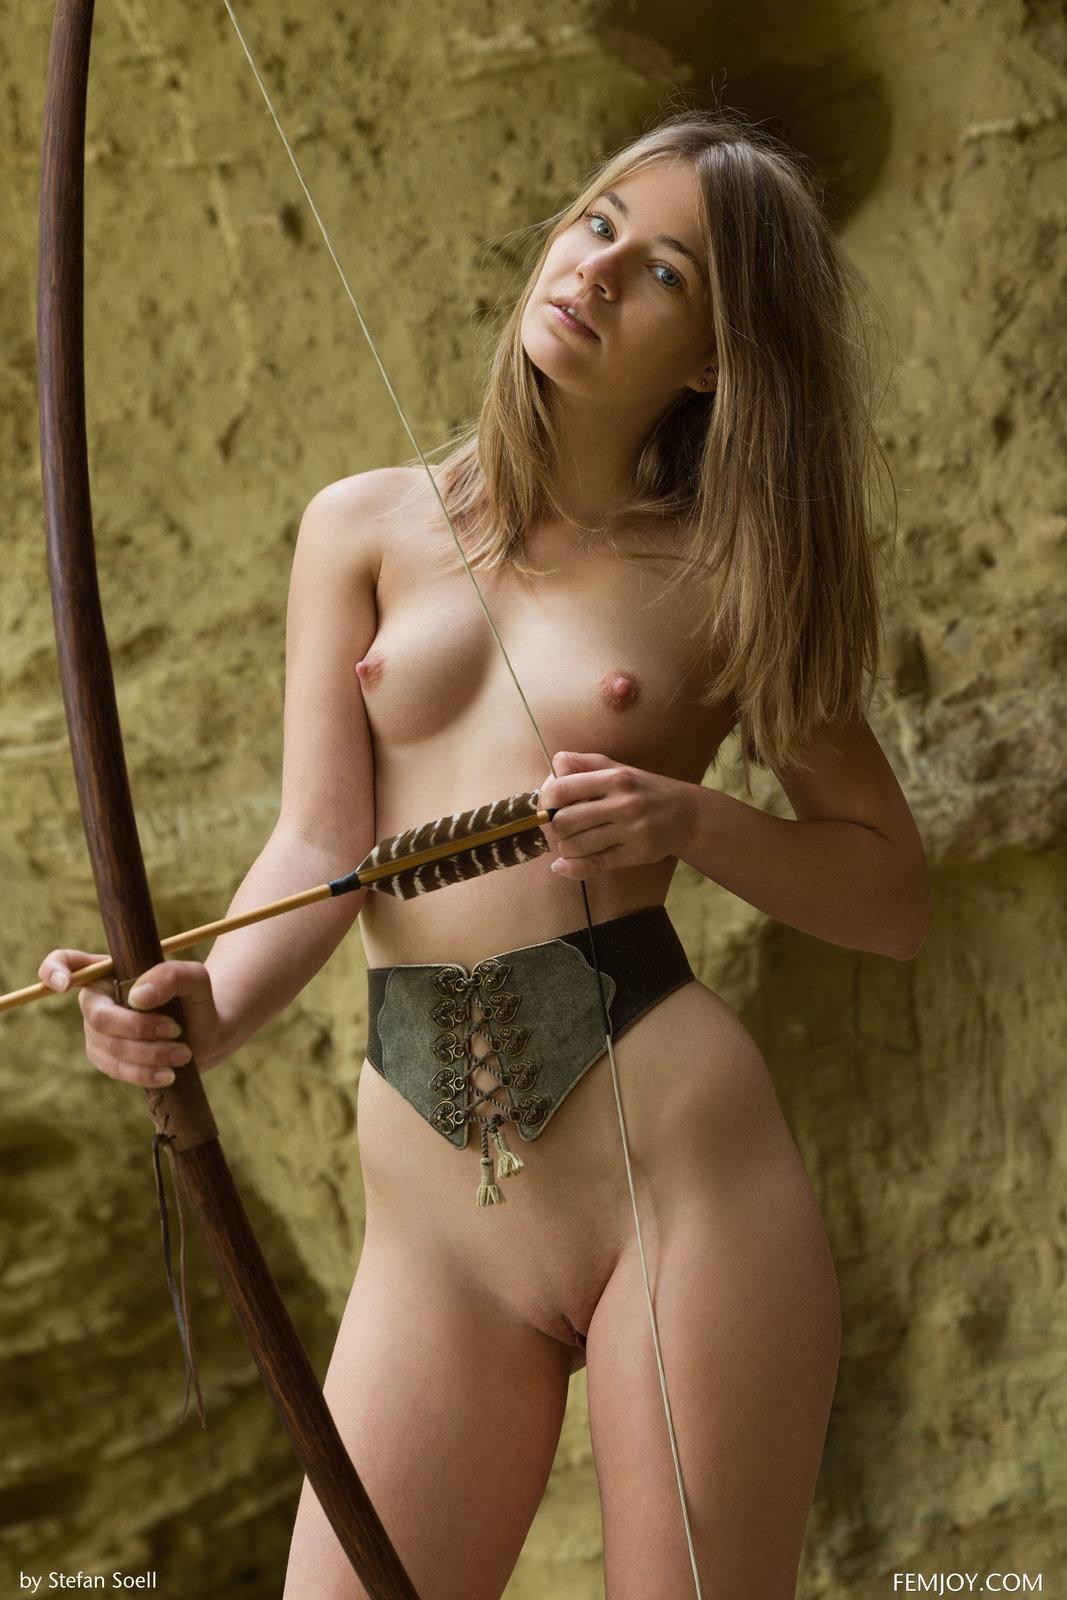 Nastya H In Nude Hunter By Femjoy 12 Photos  Erotic